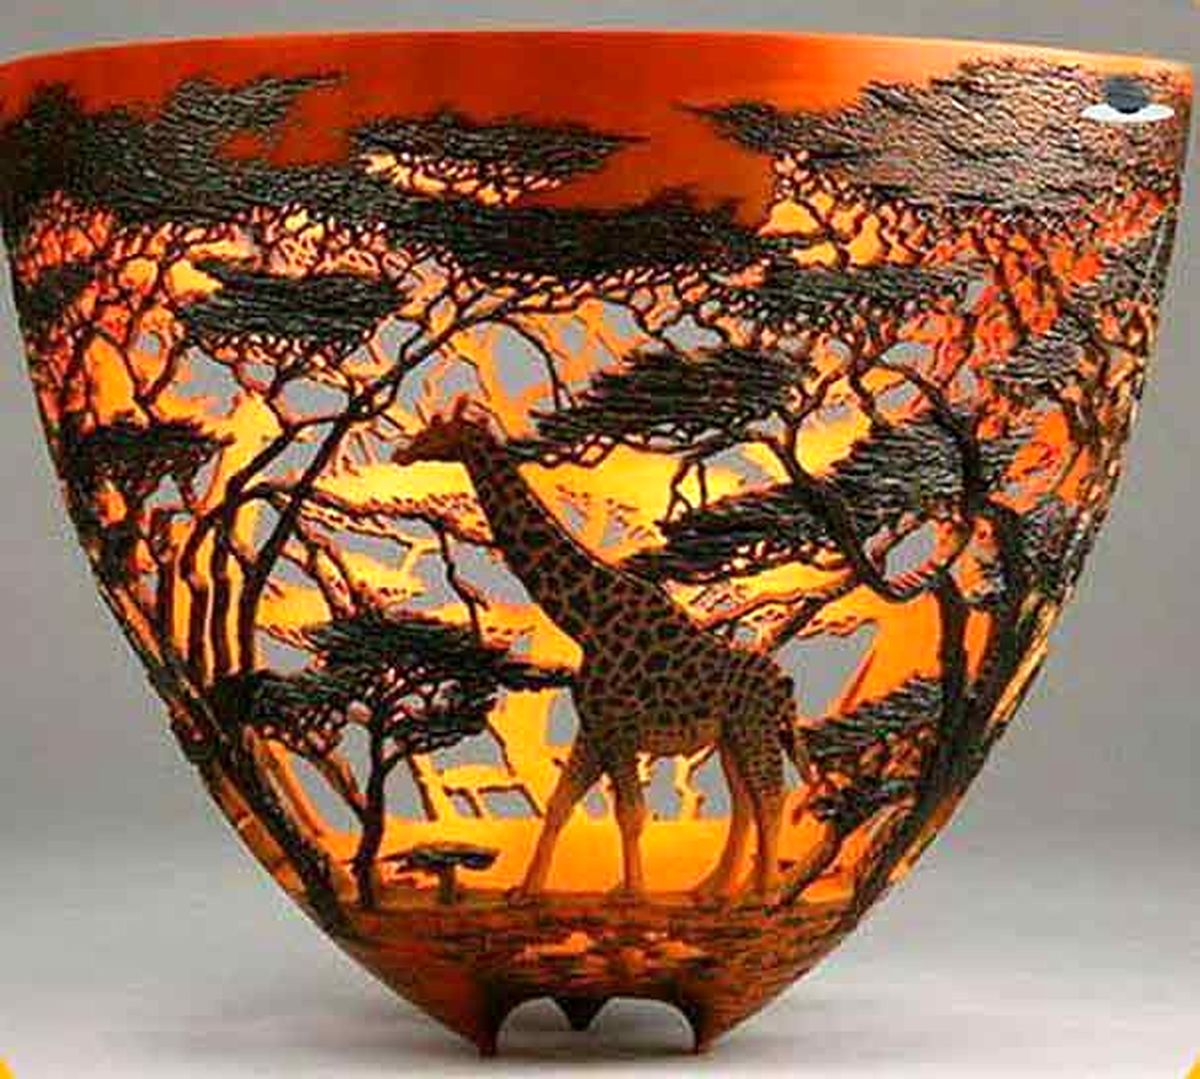 هنر دست حیرت انگیز یک هنرمند کنیایی|عکس